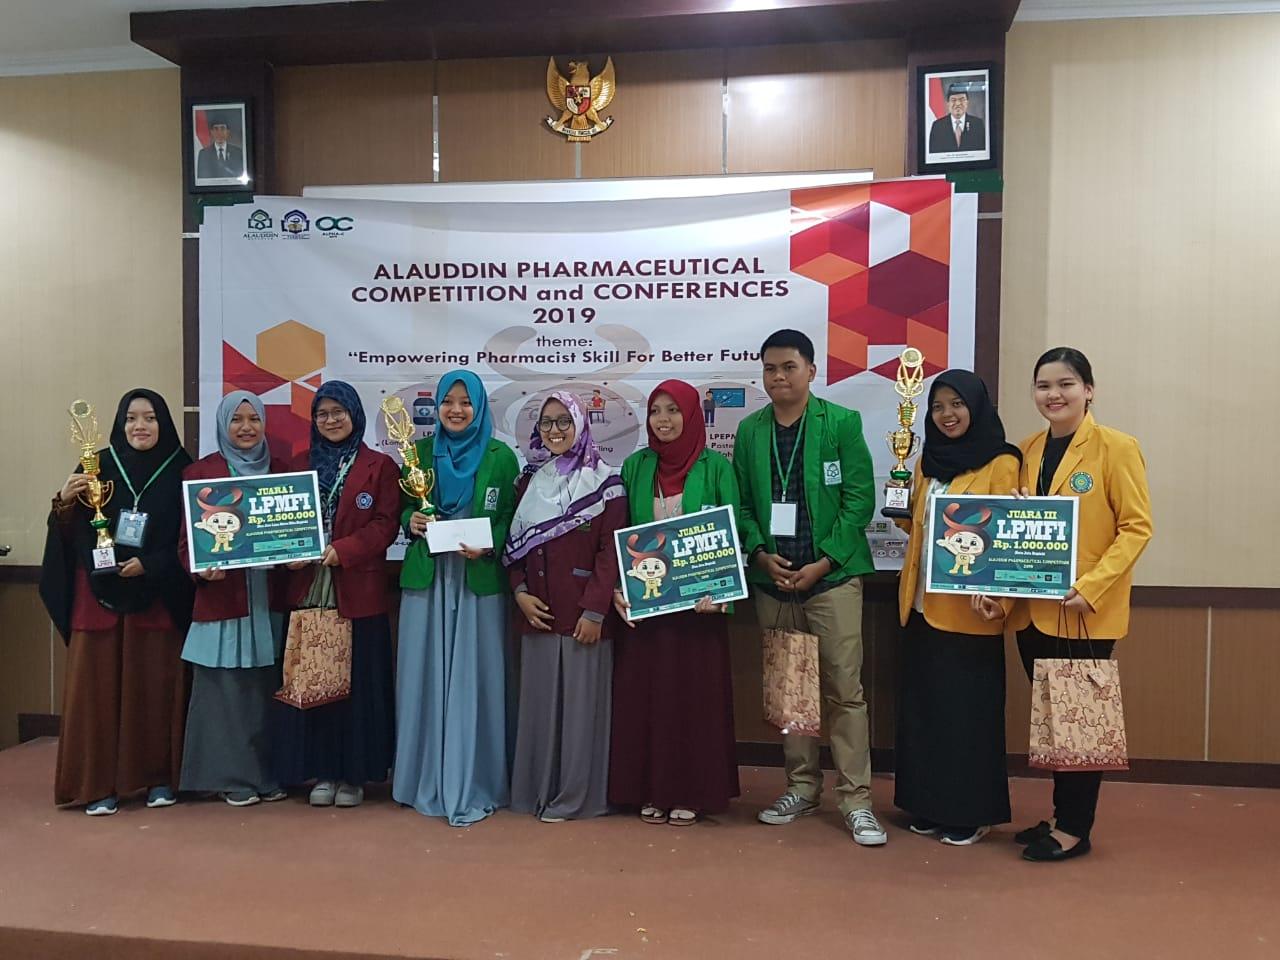 Mahasiswa Farmasi Raih Juara III Alauddin's Pharmaceutical Competition & Confrerences 2019